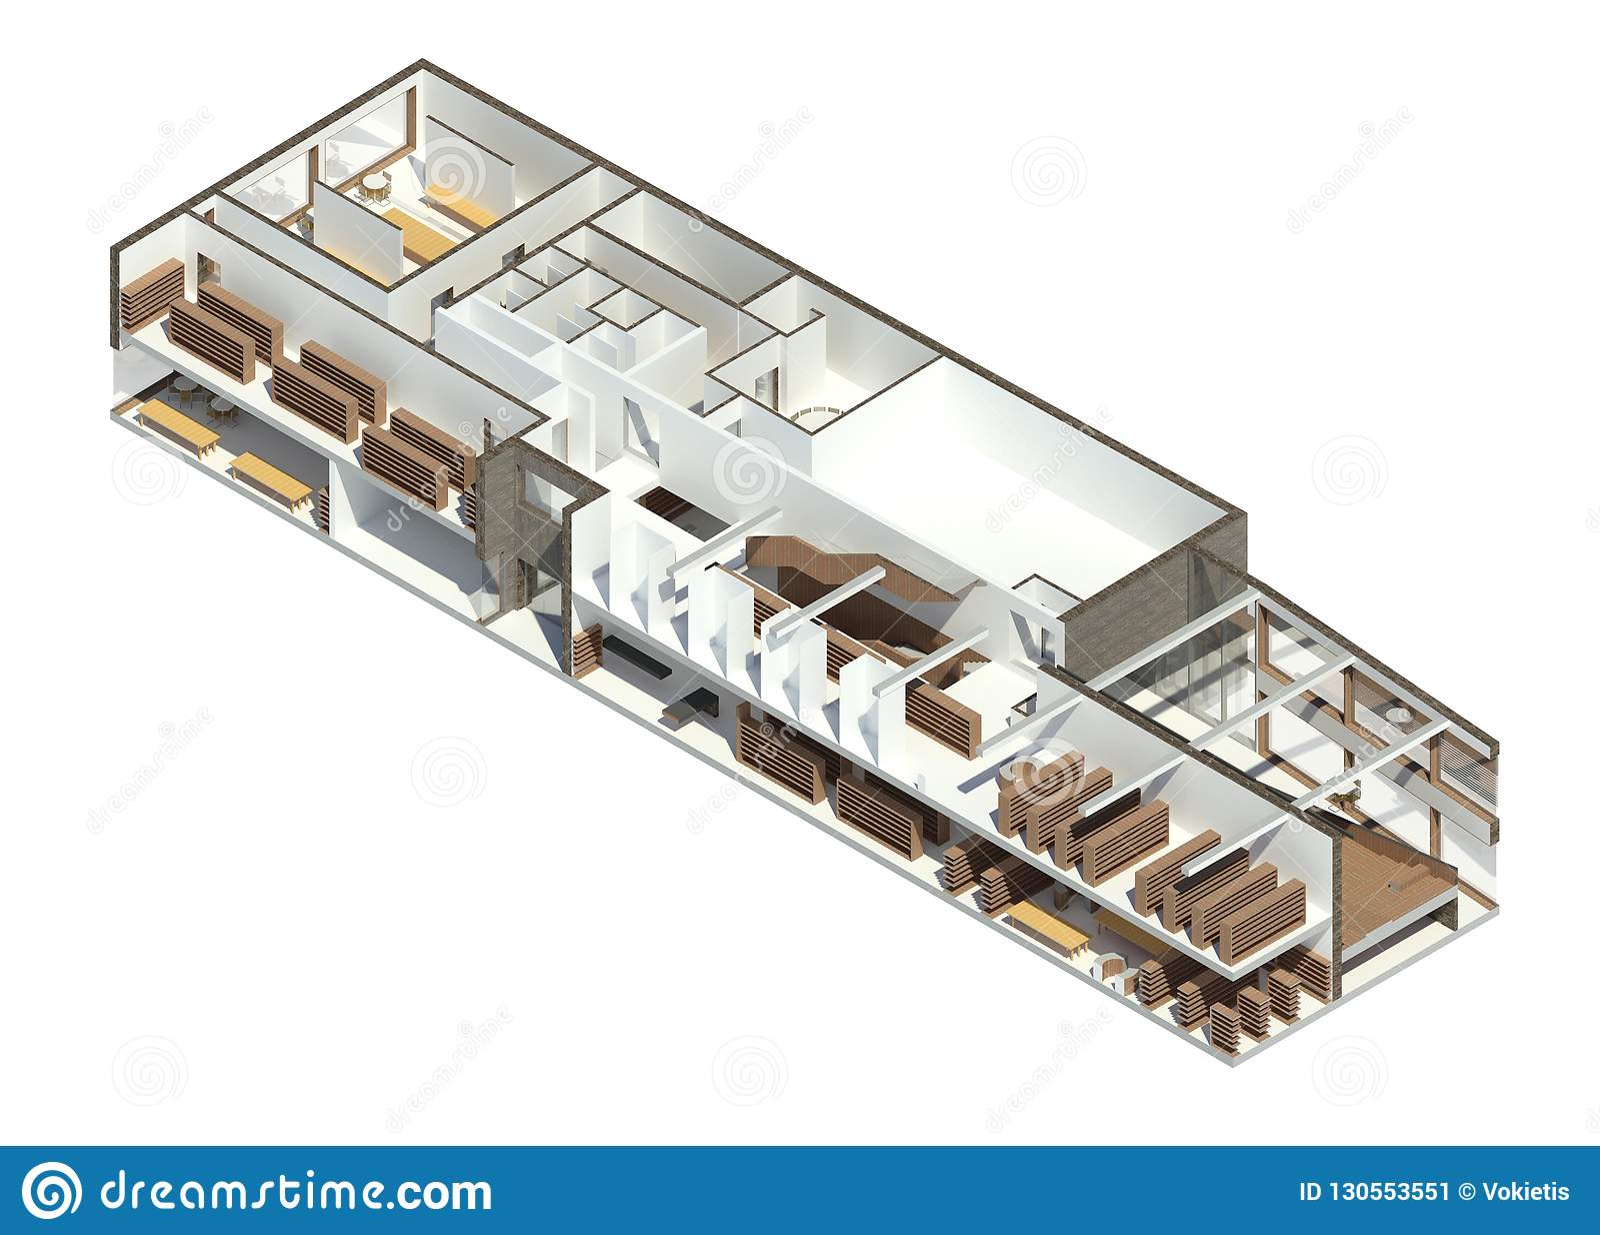 3D render: BIM model of the library